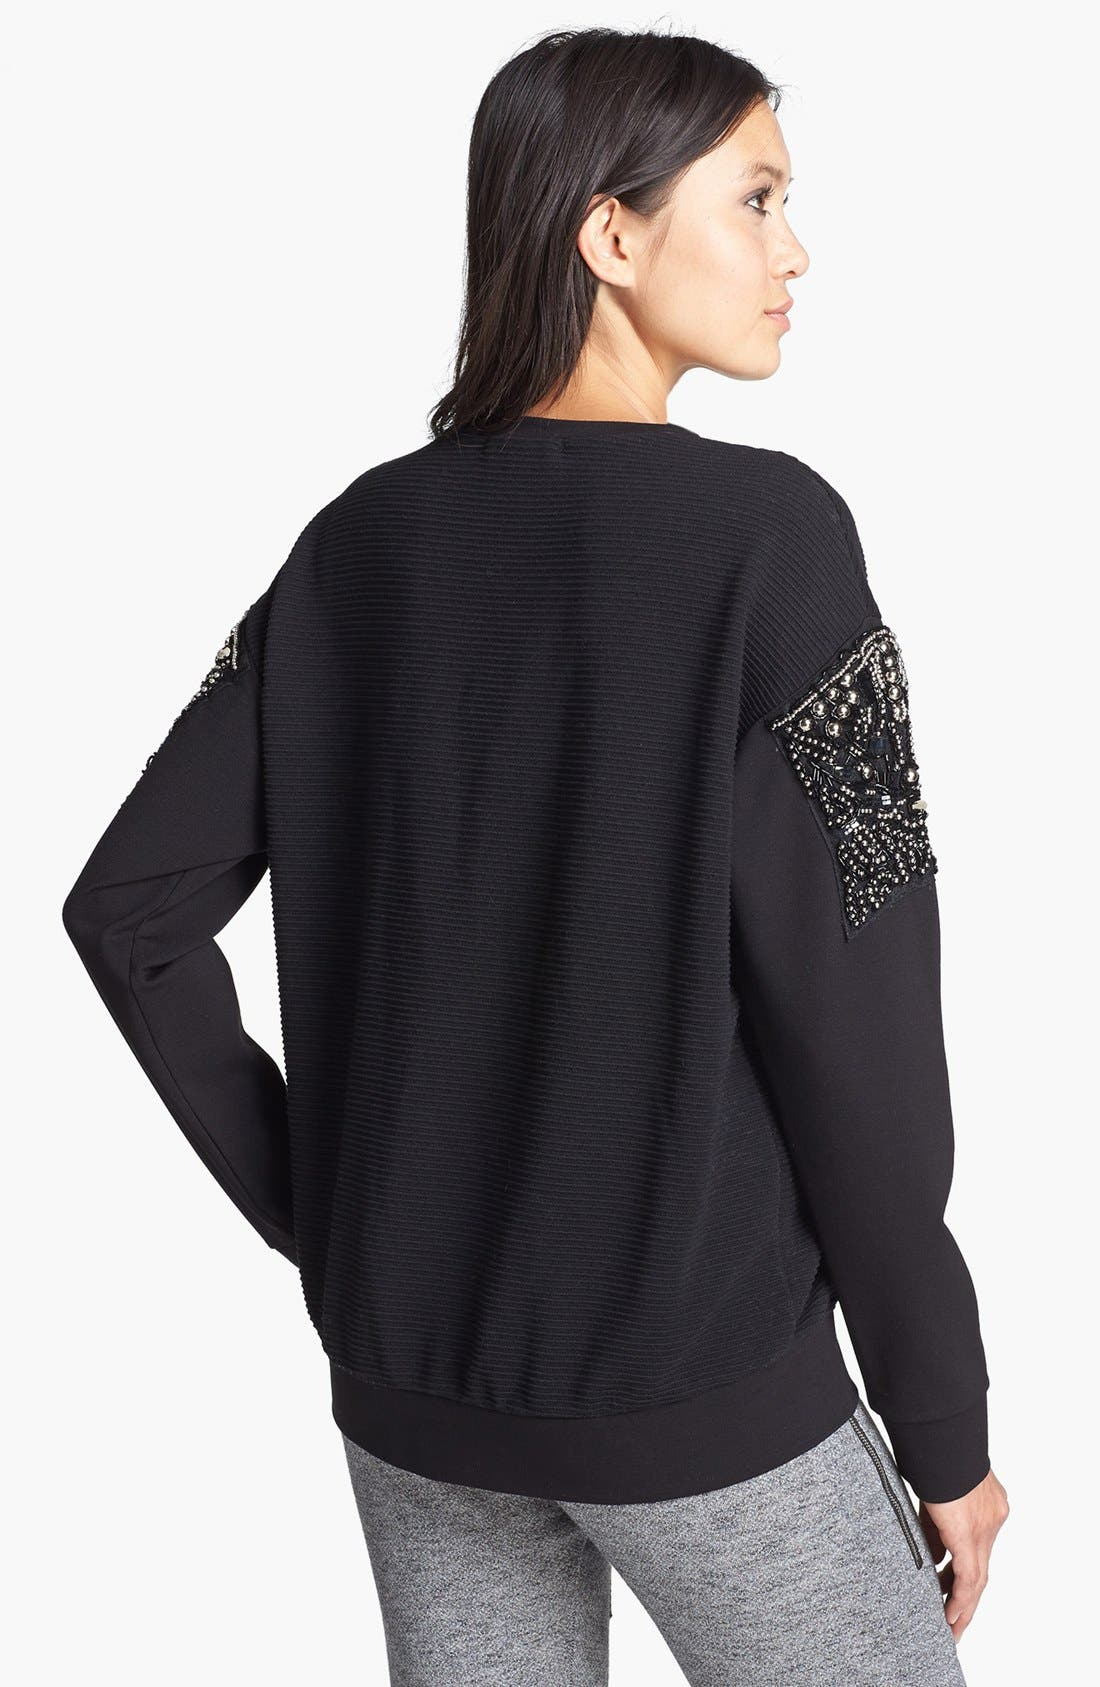 Alternate Image 2  - Rules of Etiquette 'Arm Candy' Embellished Sweatshirt